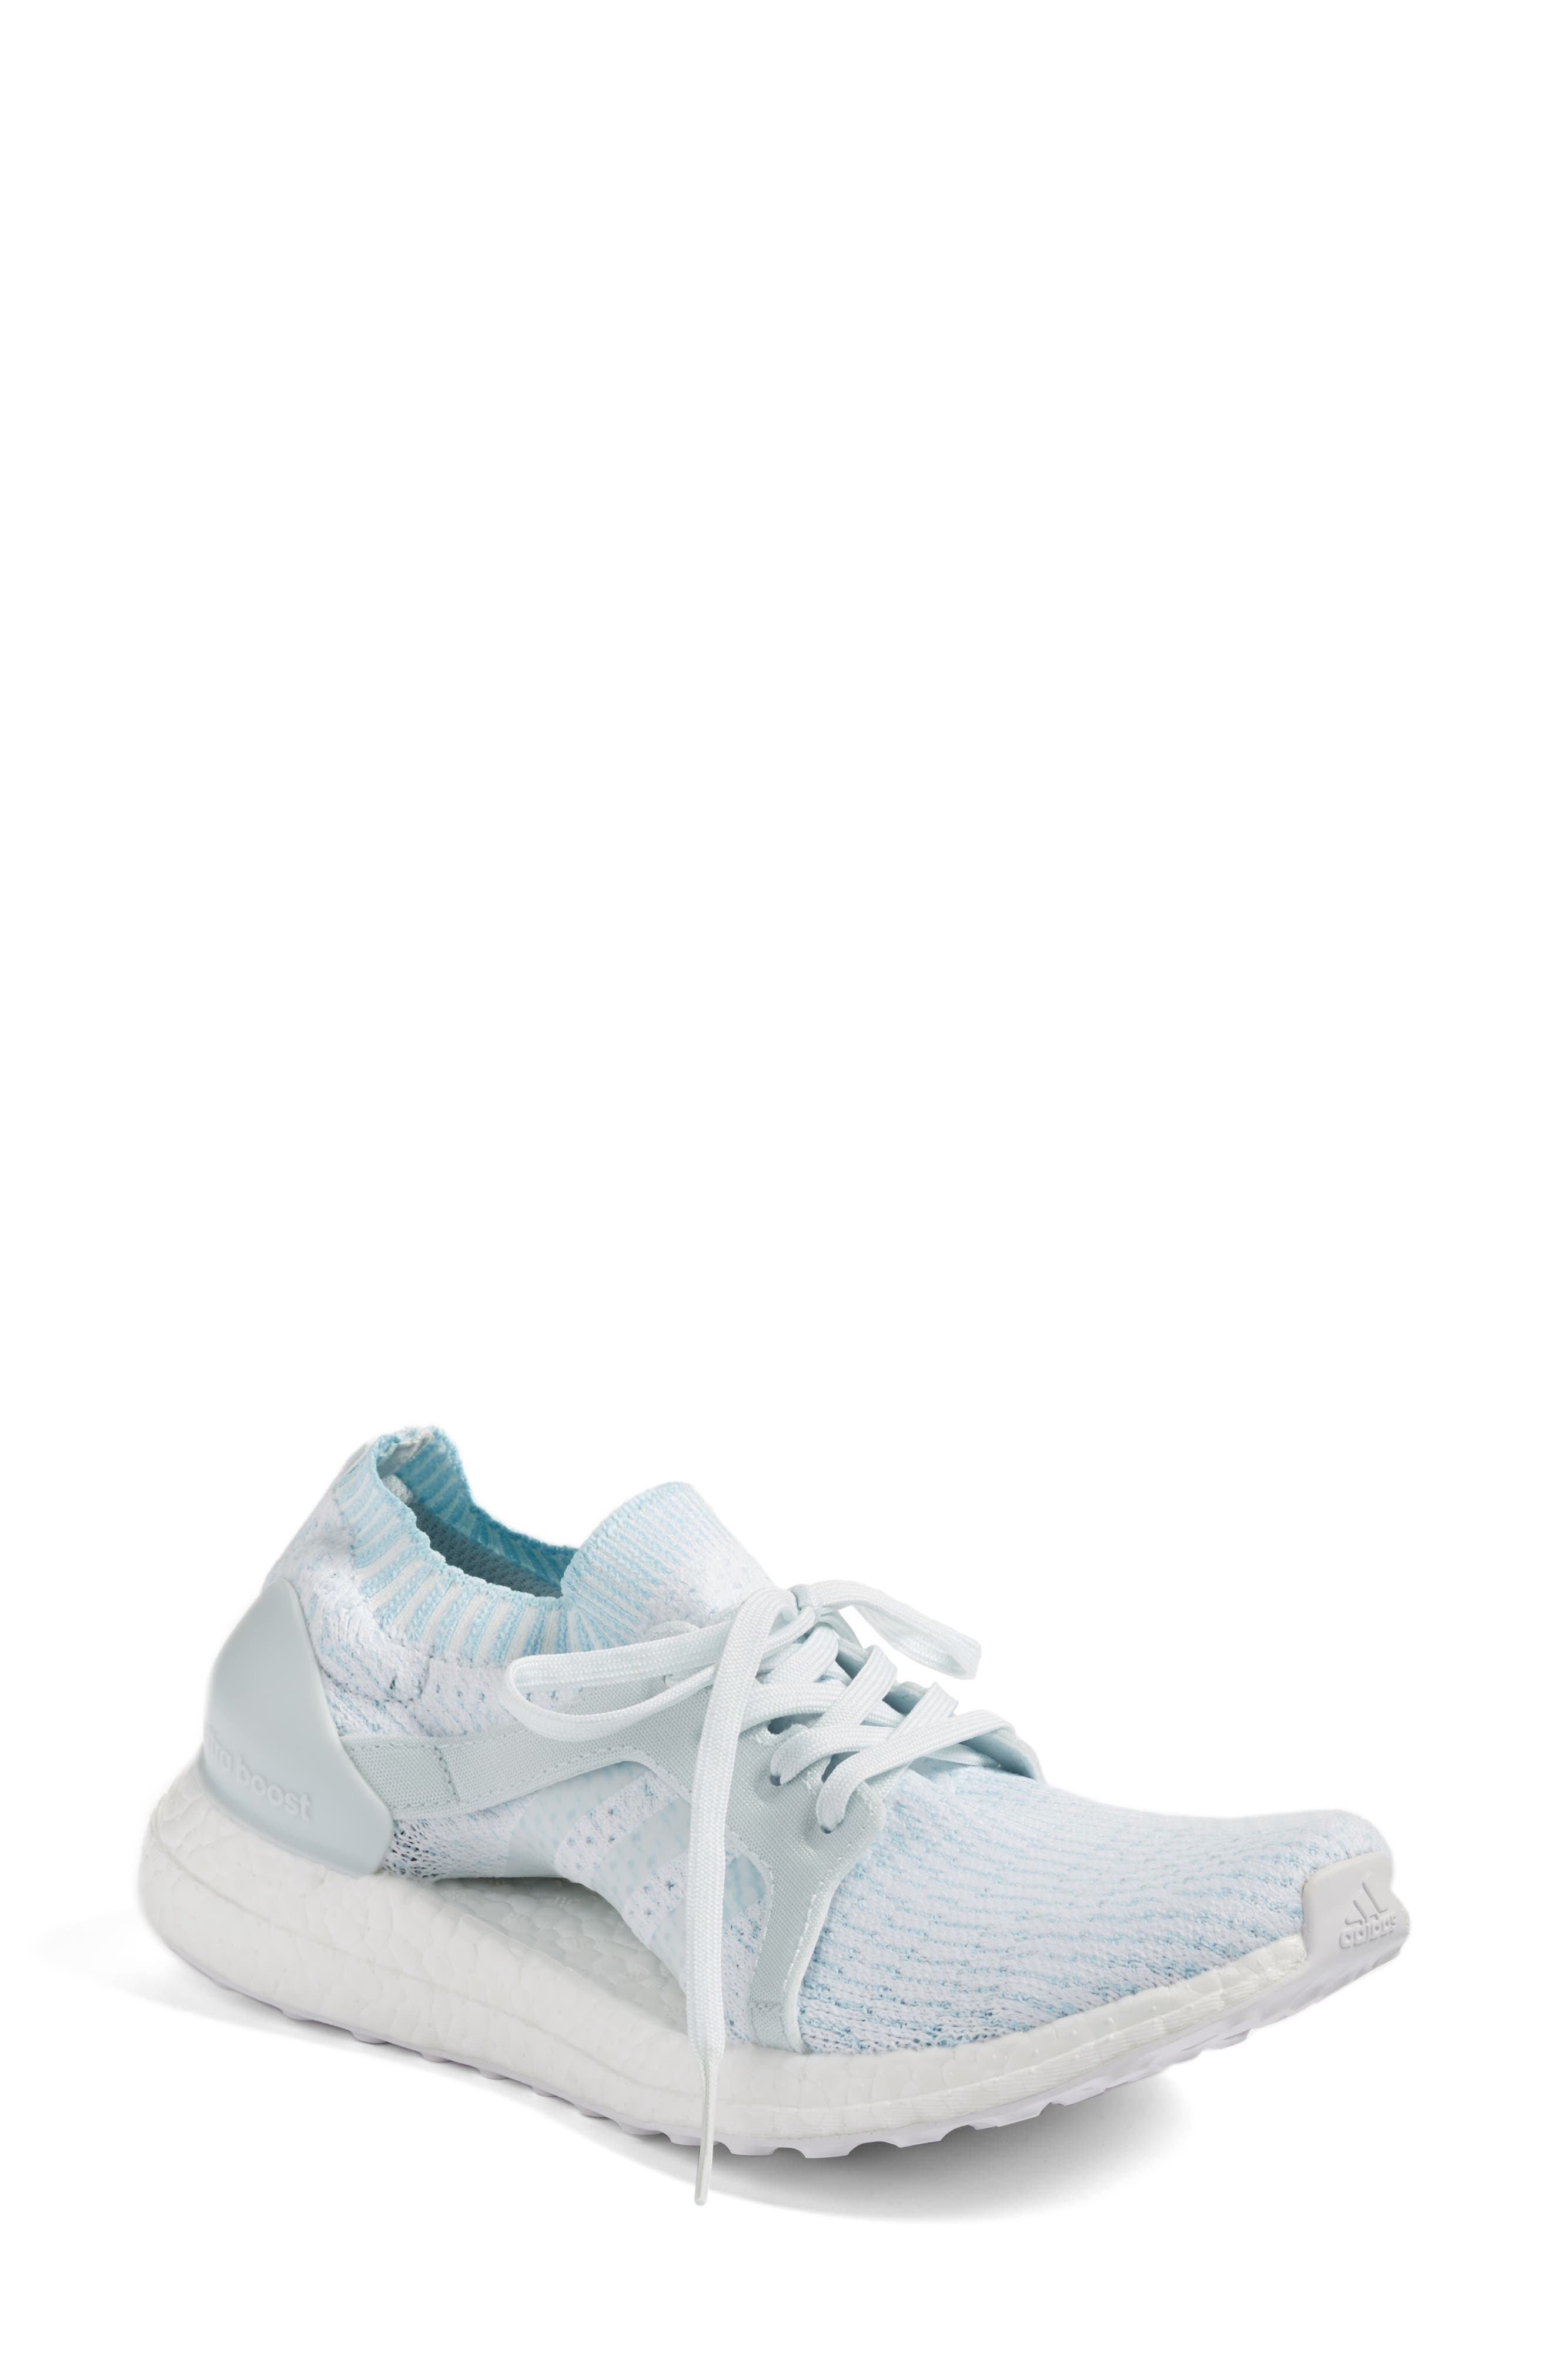 Alternate Image 1 Selected - adidas Ultraboost x Parley Running Shoe (Women)